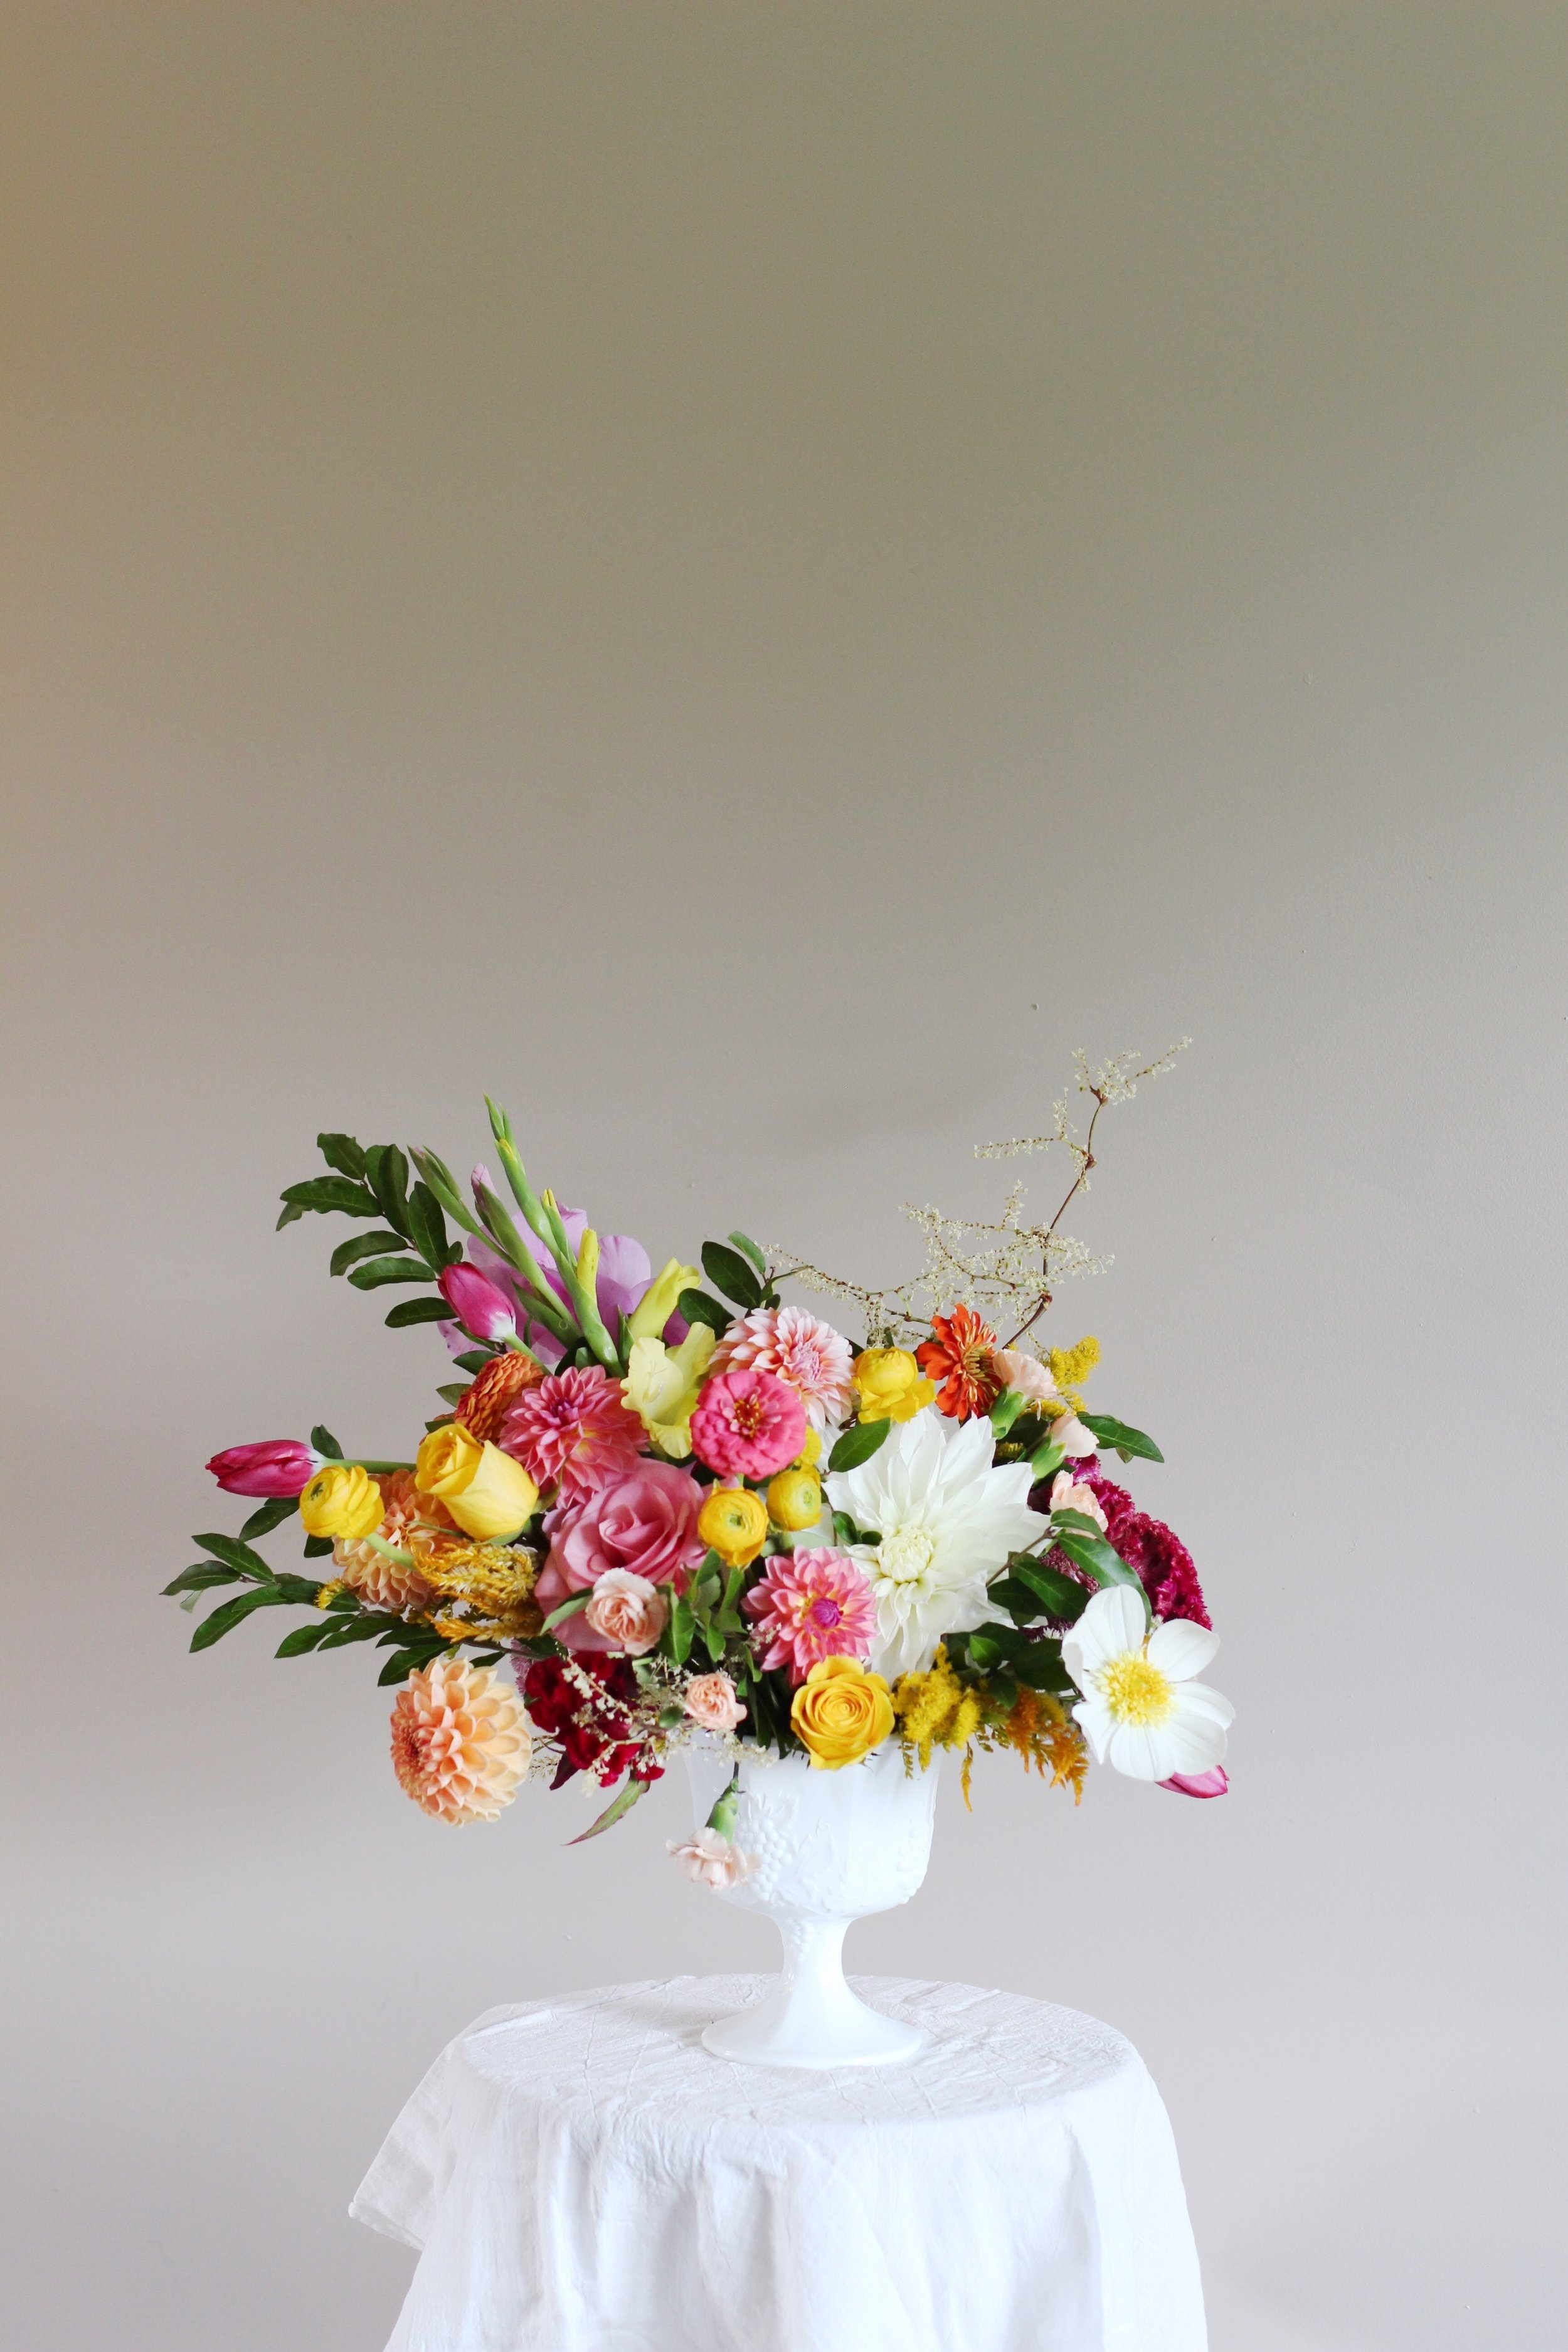 Lemon & Pink Lollipop | Bouquet, Compote arrangement, yellow ranunuculus, dinner plate dahlia white, pink dahlia, cosmos,